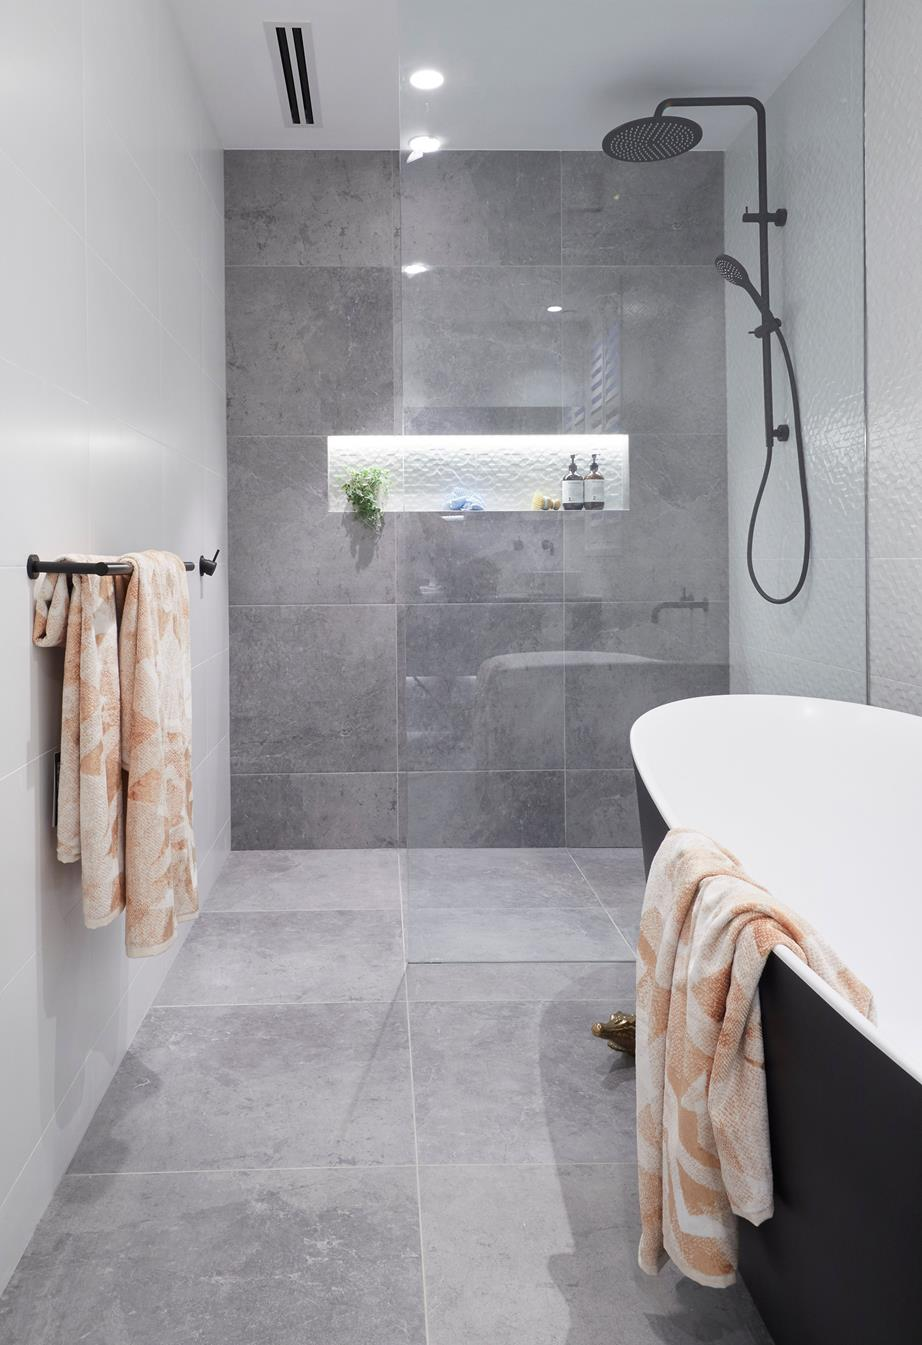 1540187577044_rm-10-challenge-bathroom-hayden--sara-11.jpg